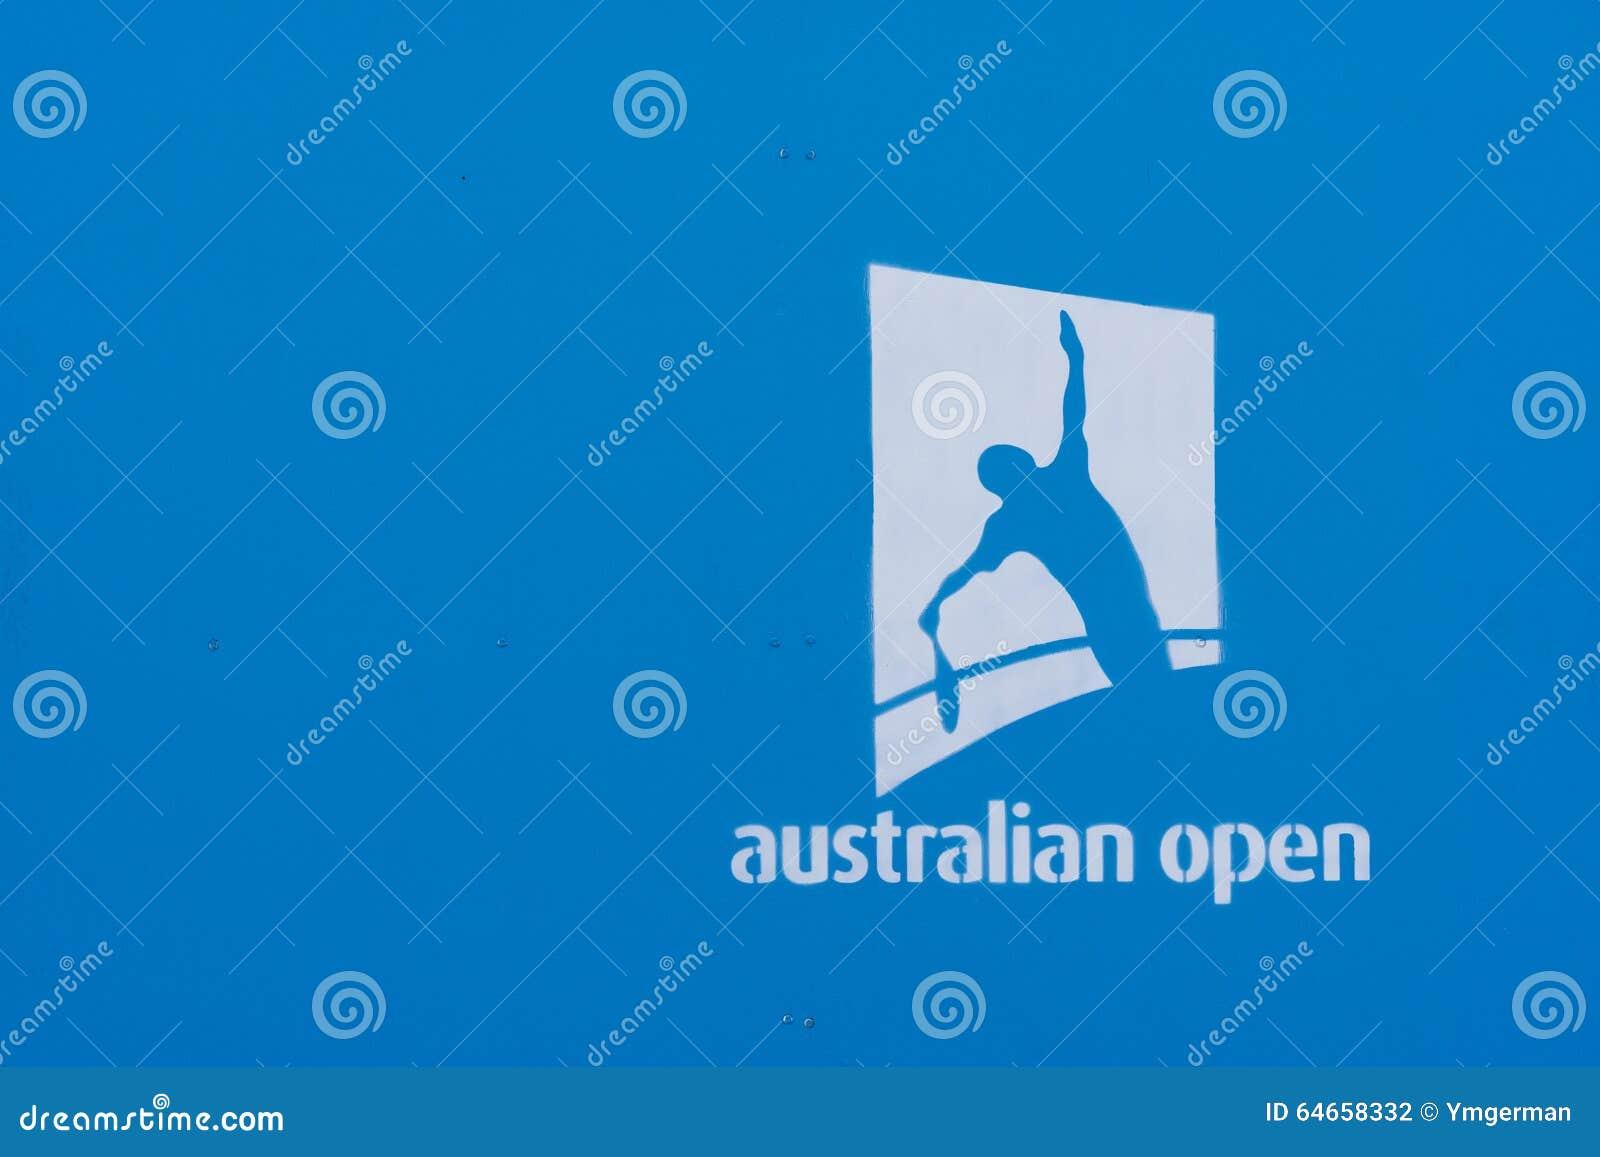 australian open logo on a blue wall editorial photography